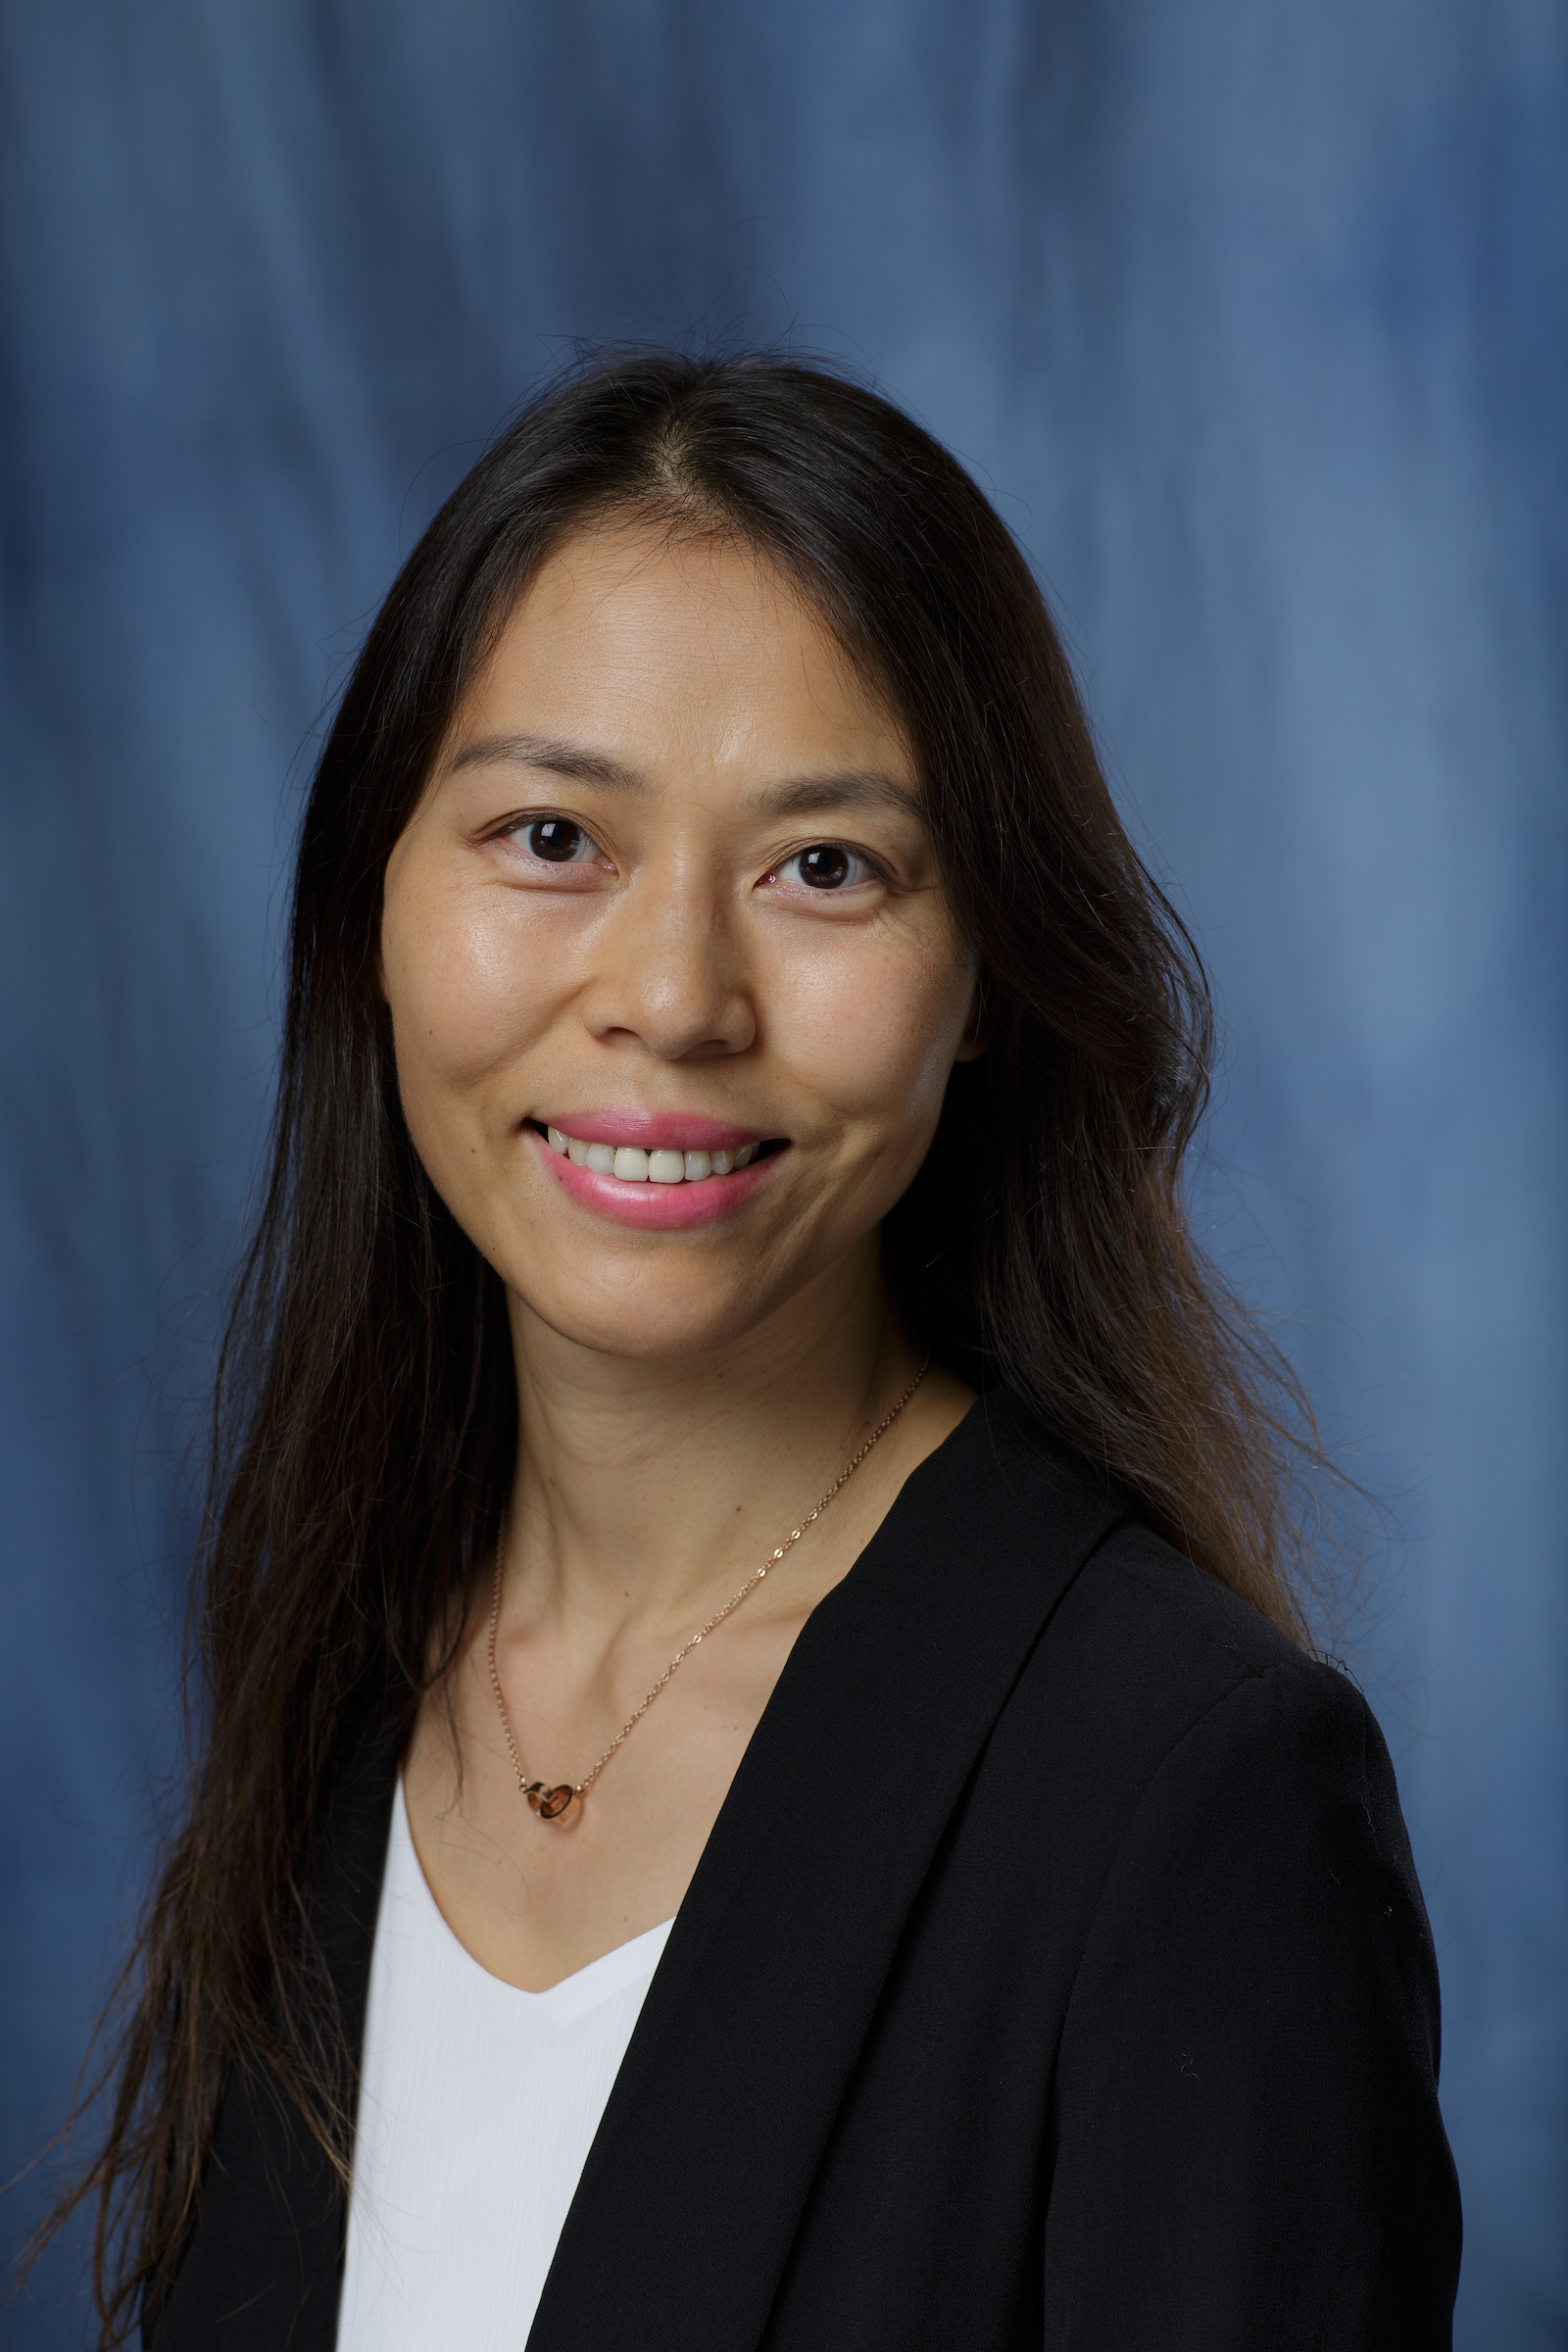 Zhihui Yang, Ph.D.